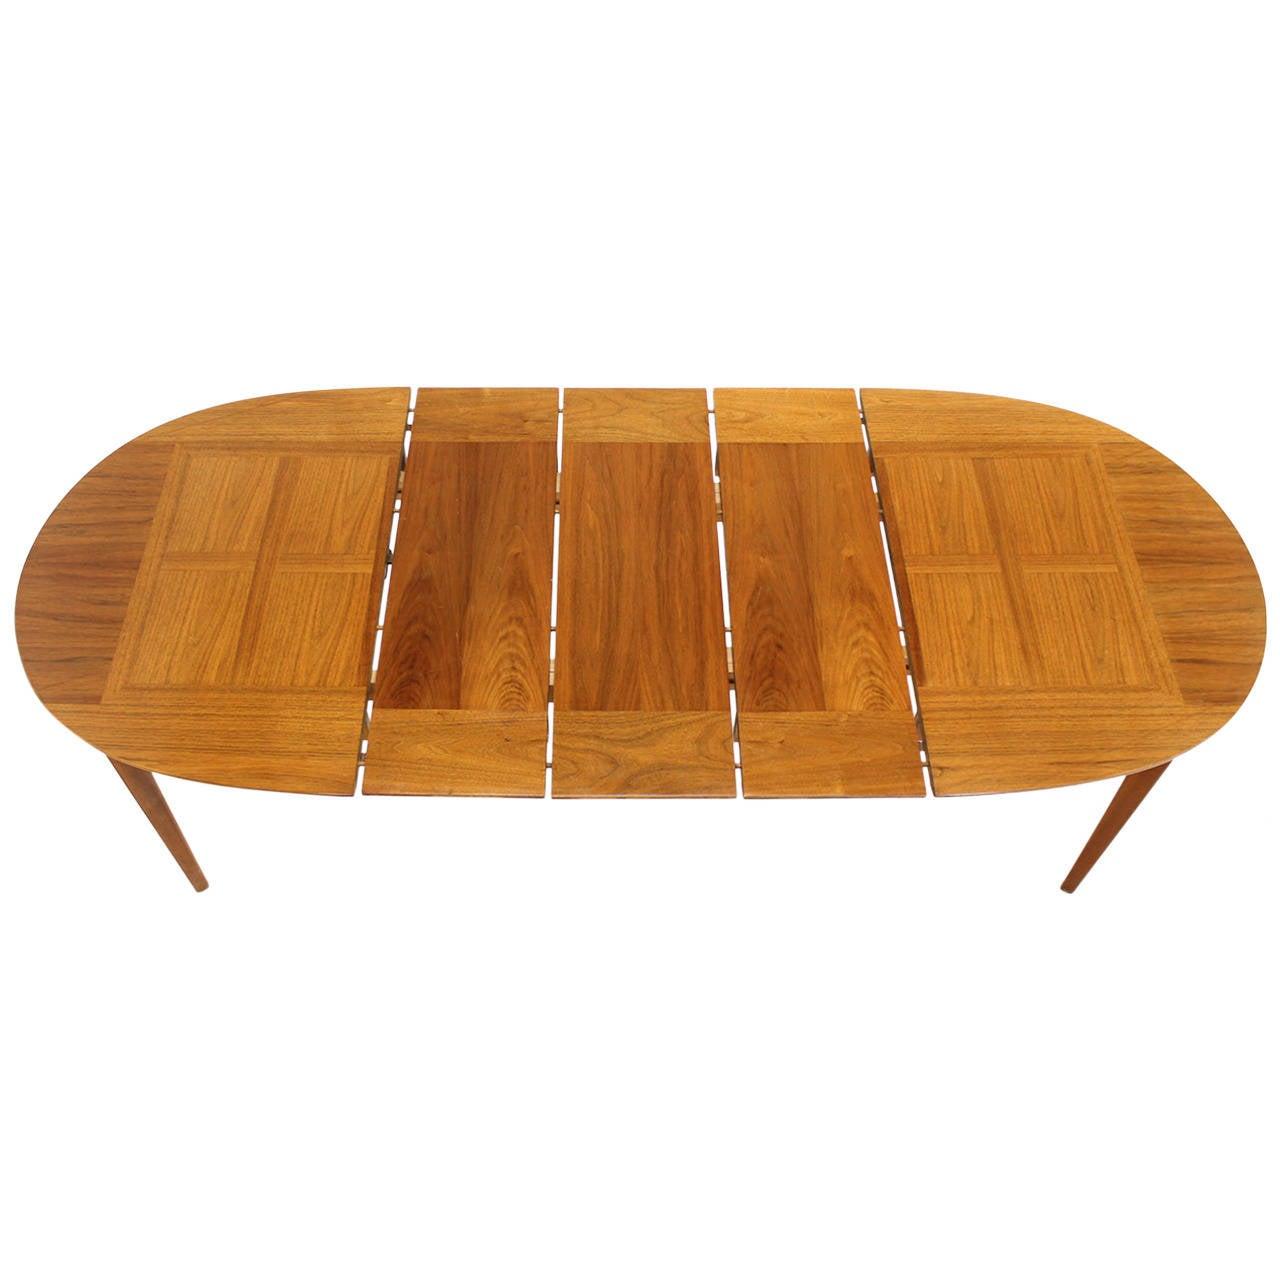 Mid Century Modern Walnut Oval Dining Table with Three  : 1465742l from www.1stdibs.com size 1280 x 1280 jpeg 89kB